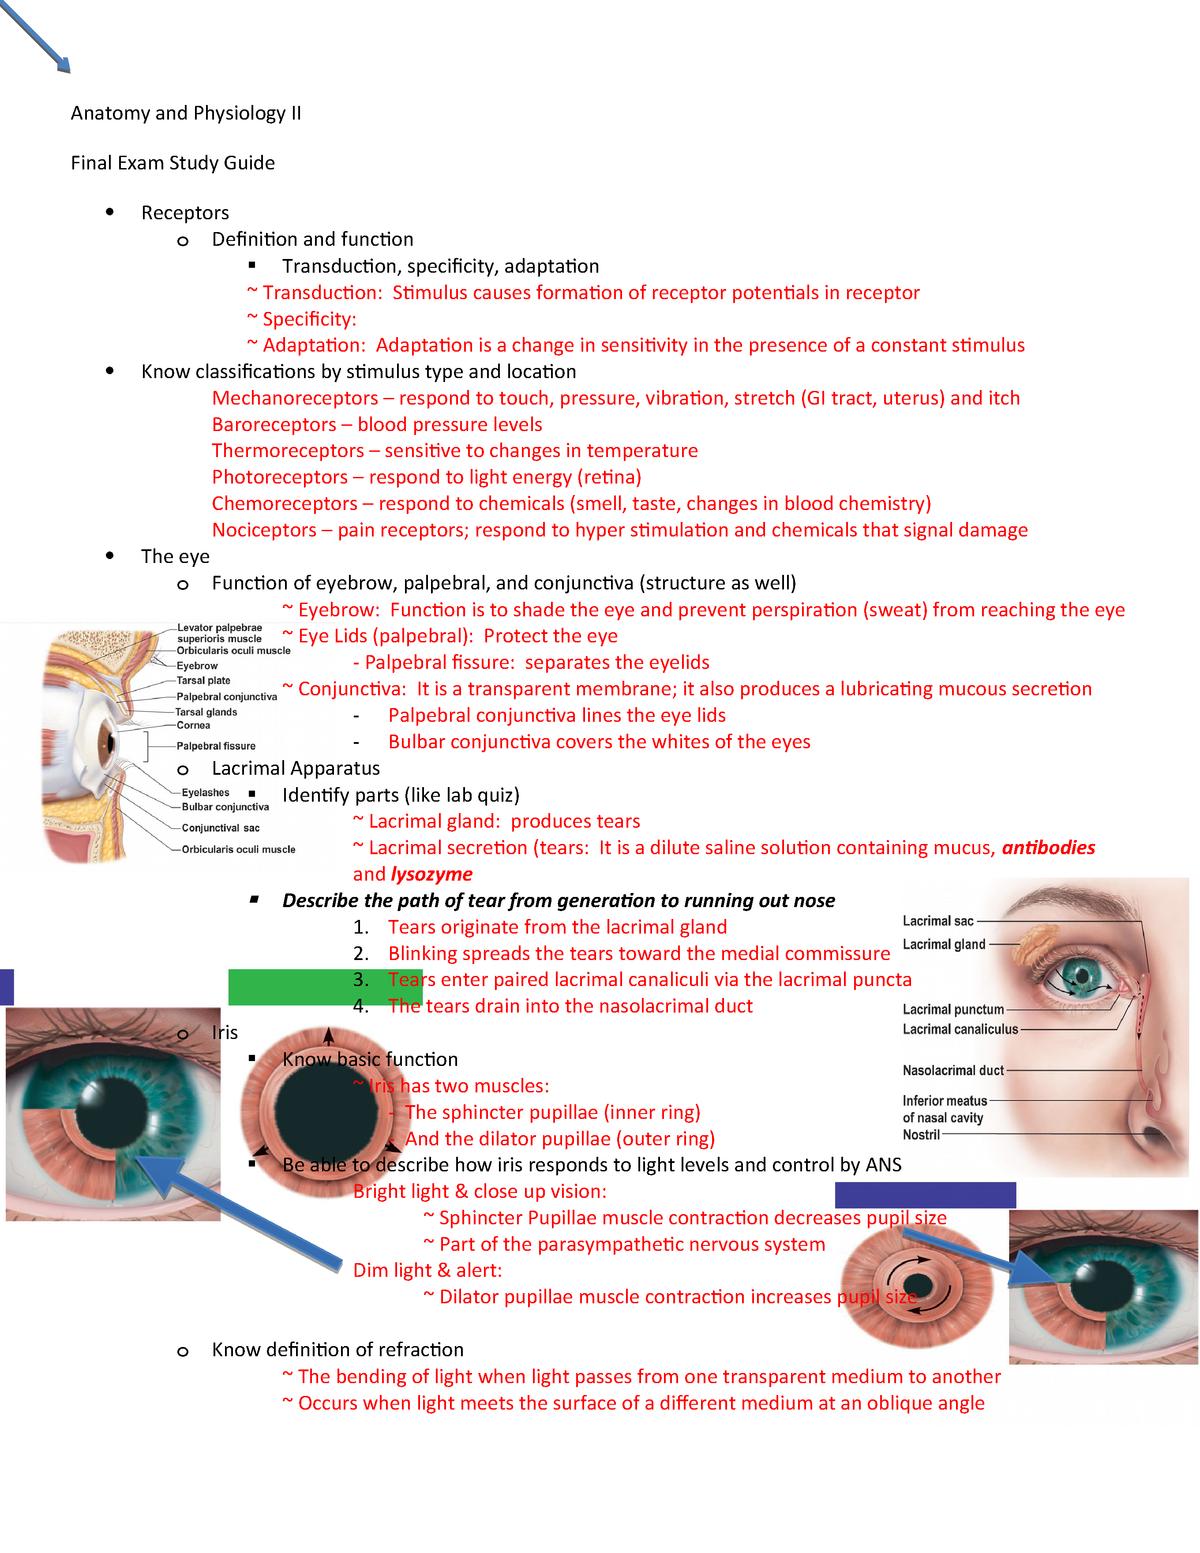 Exam 2015 - HP 105: Human Anatomy & Physiology - StuDocu